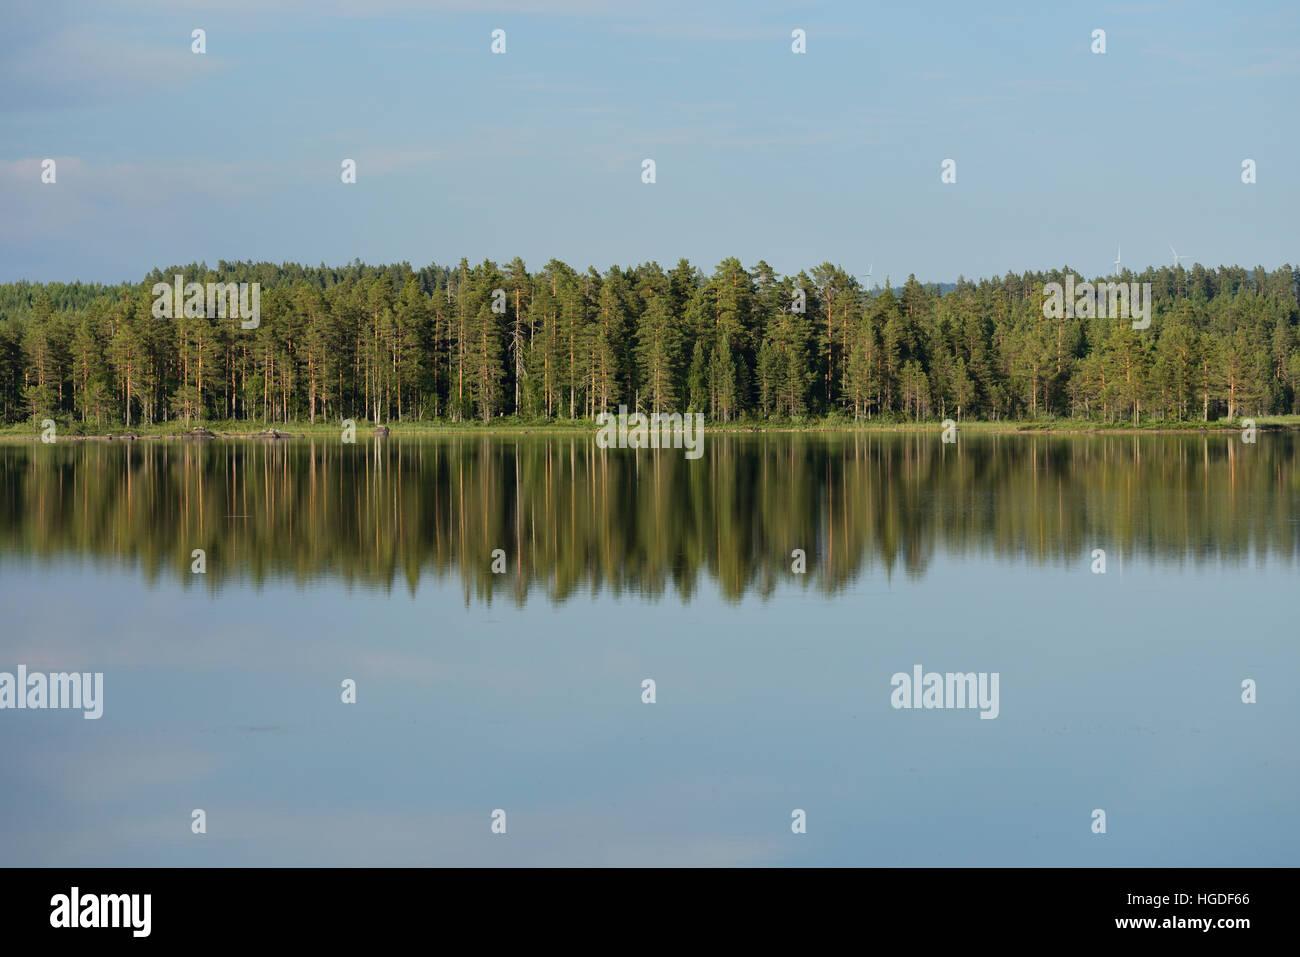 Lake Kättosjön, Dalarna, Sweden - Stock Image